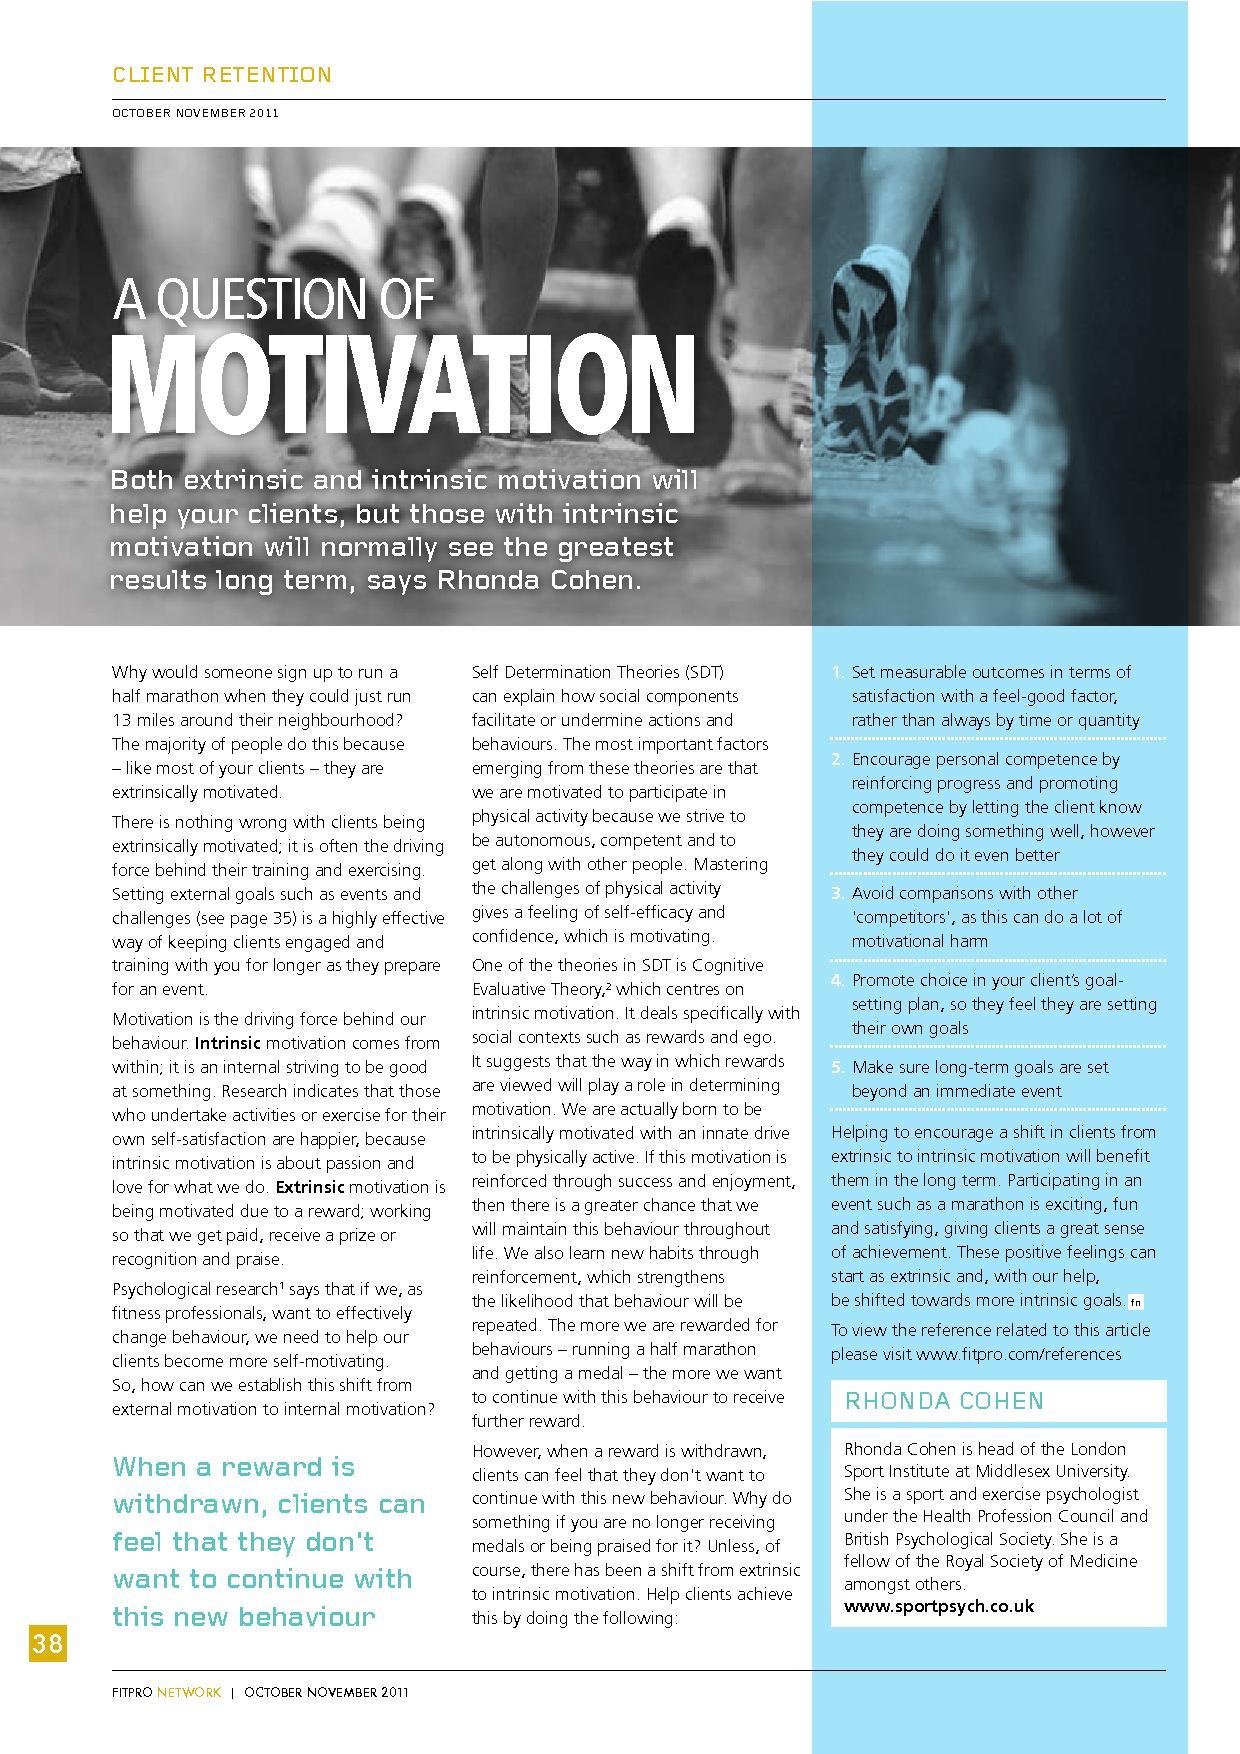 Rhonda Cohen interviewed in Fitpro Network Magazine about ...